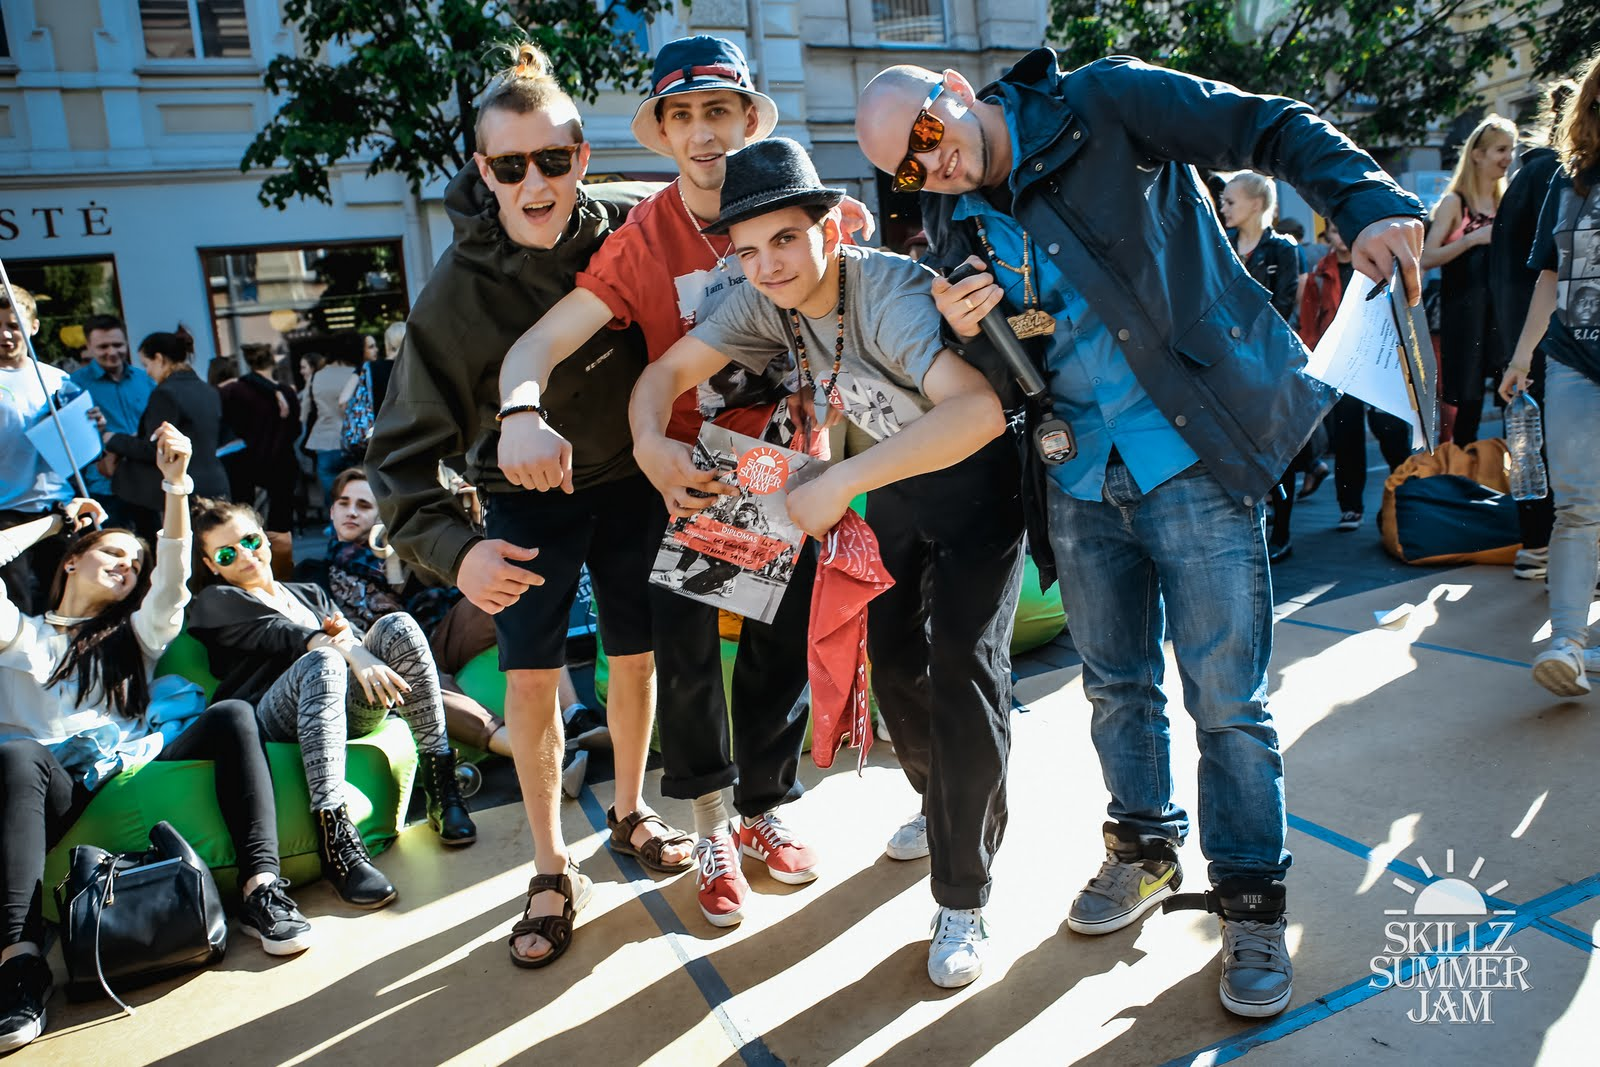 SKILLZ Summer Jam 2015 - xIMG_0624.jpg